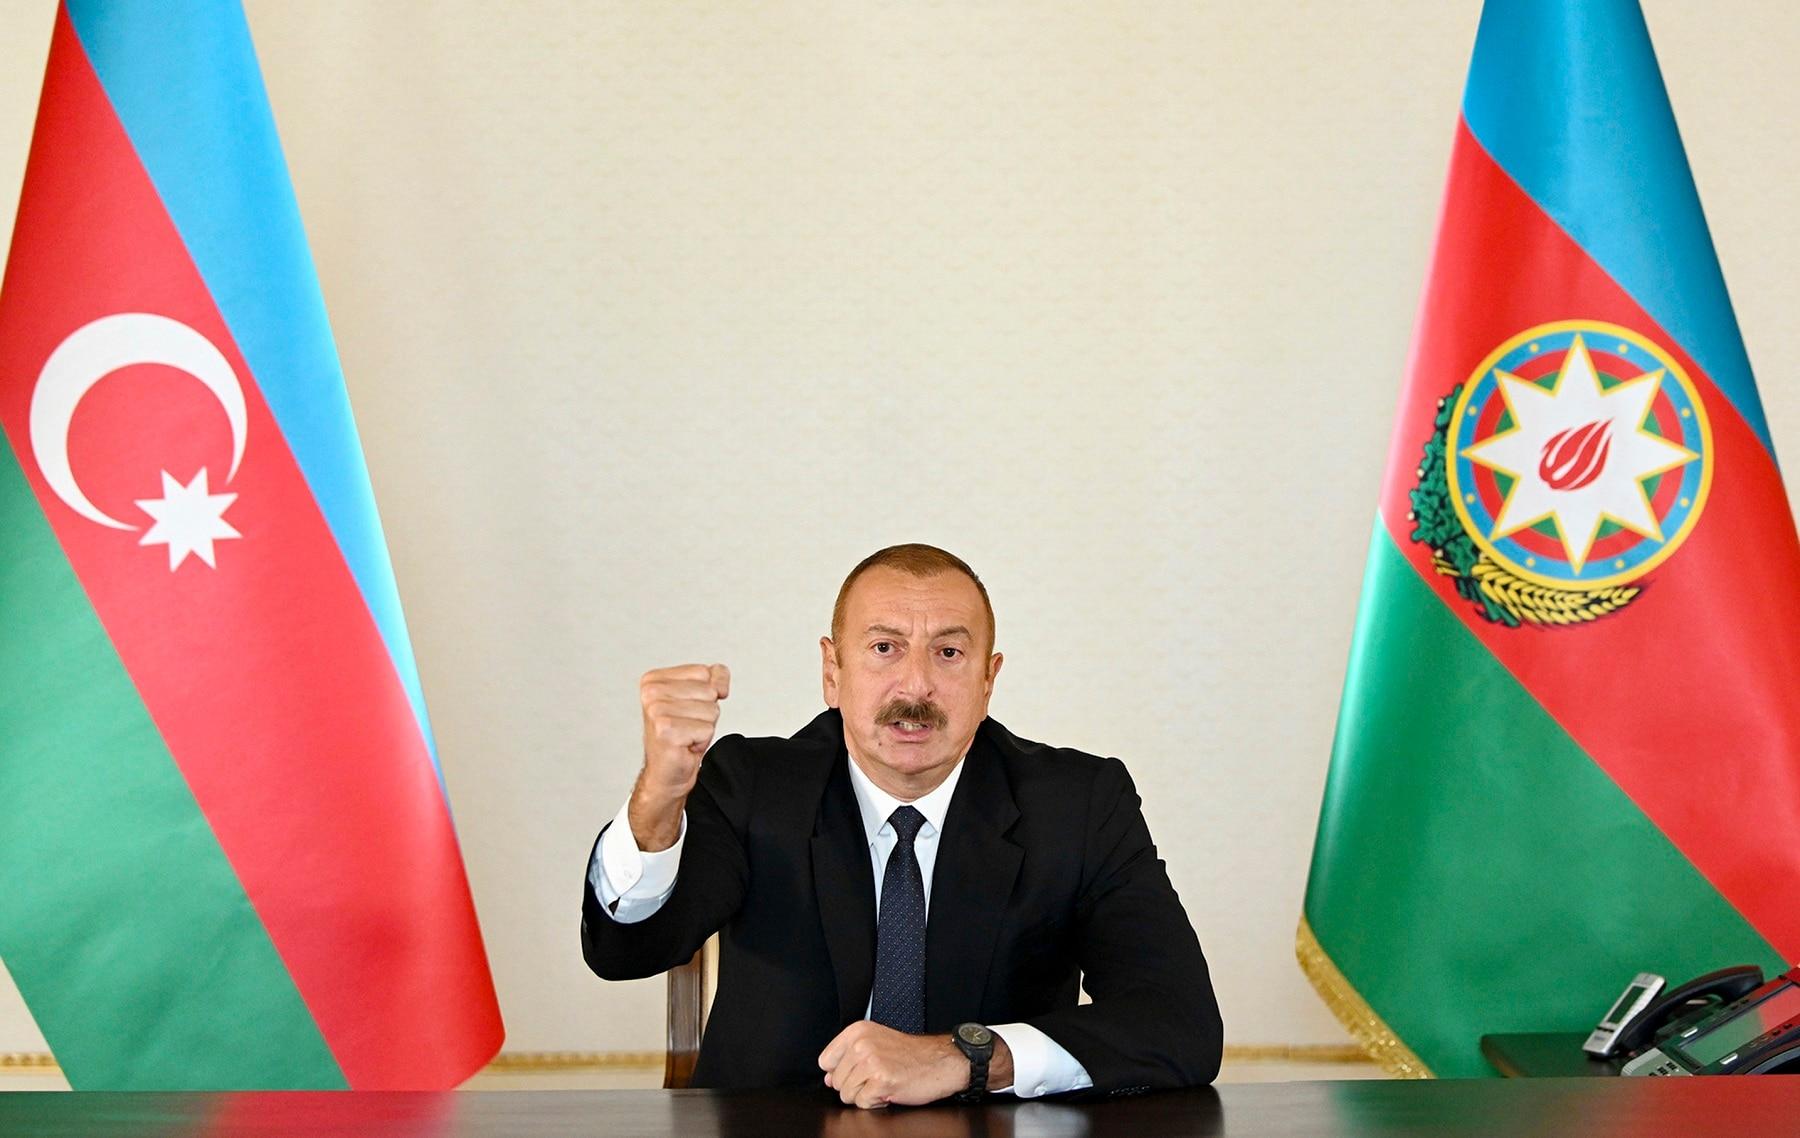 Azerbaijani President Ilham Aliyev gestures as he addresses the nation in Baku, Azerbaijan.